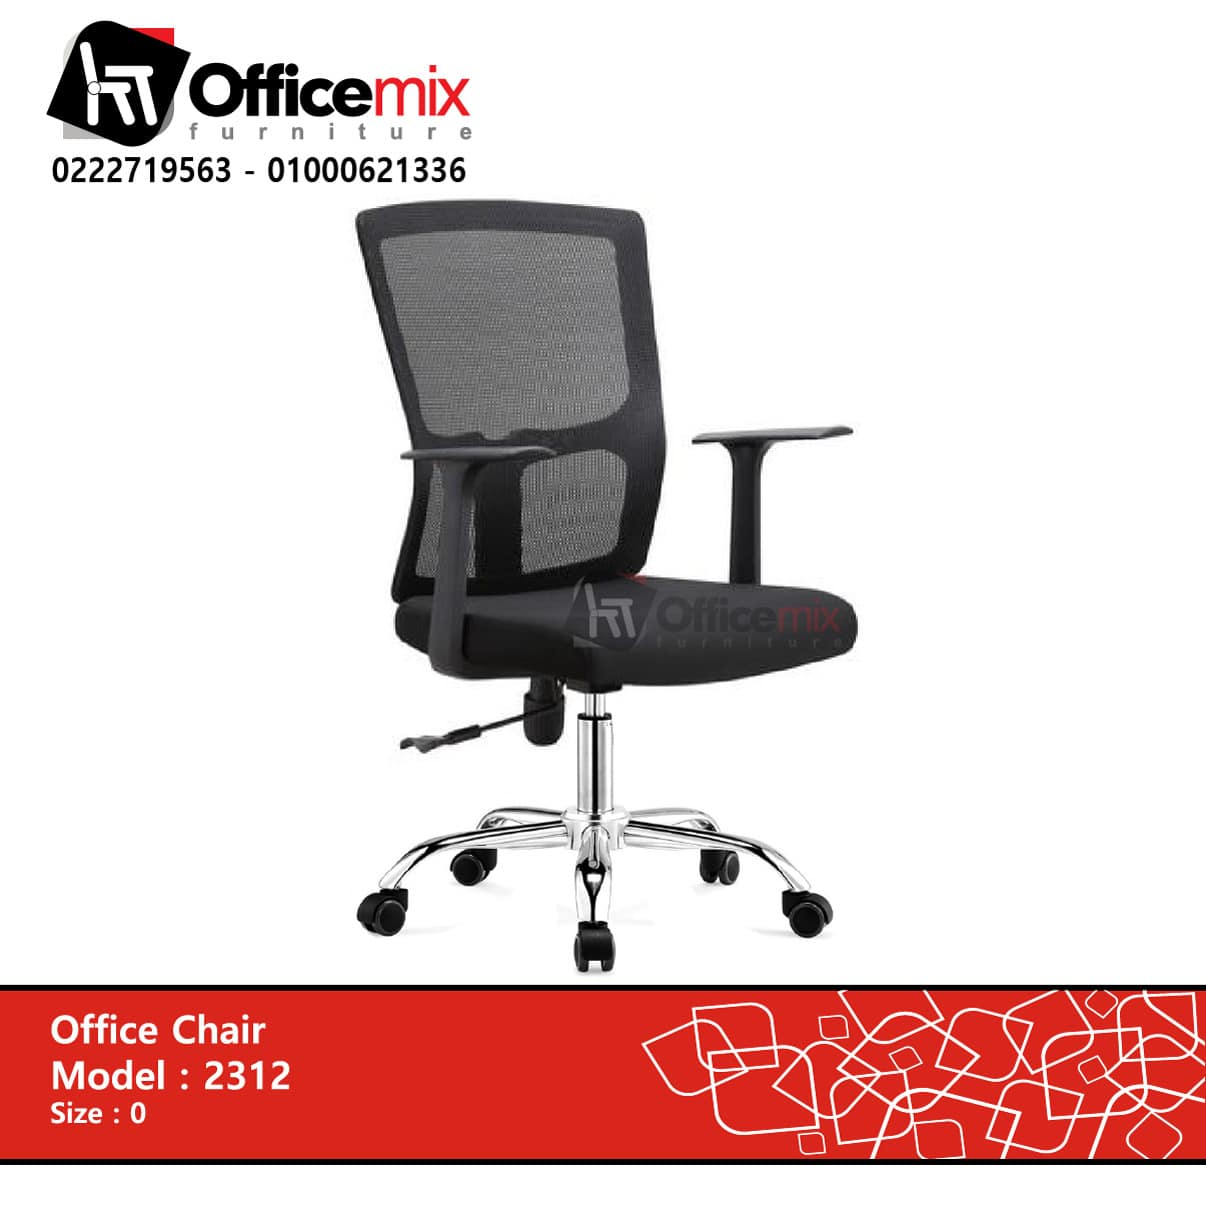 office mix Staff chair 2312